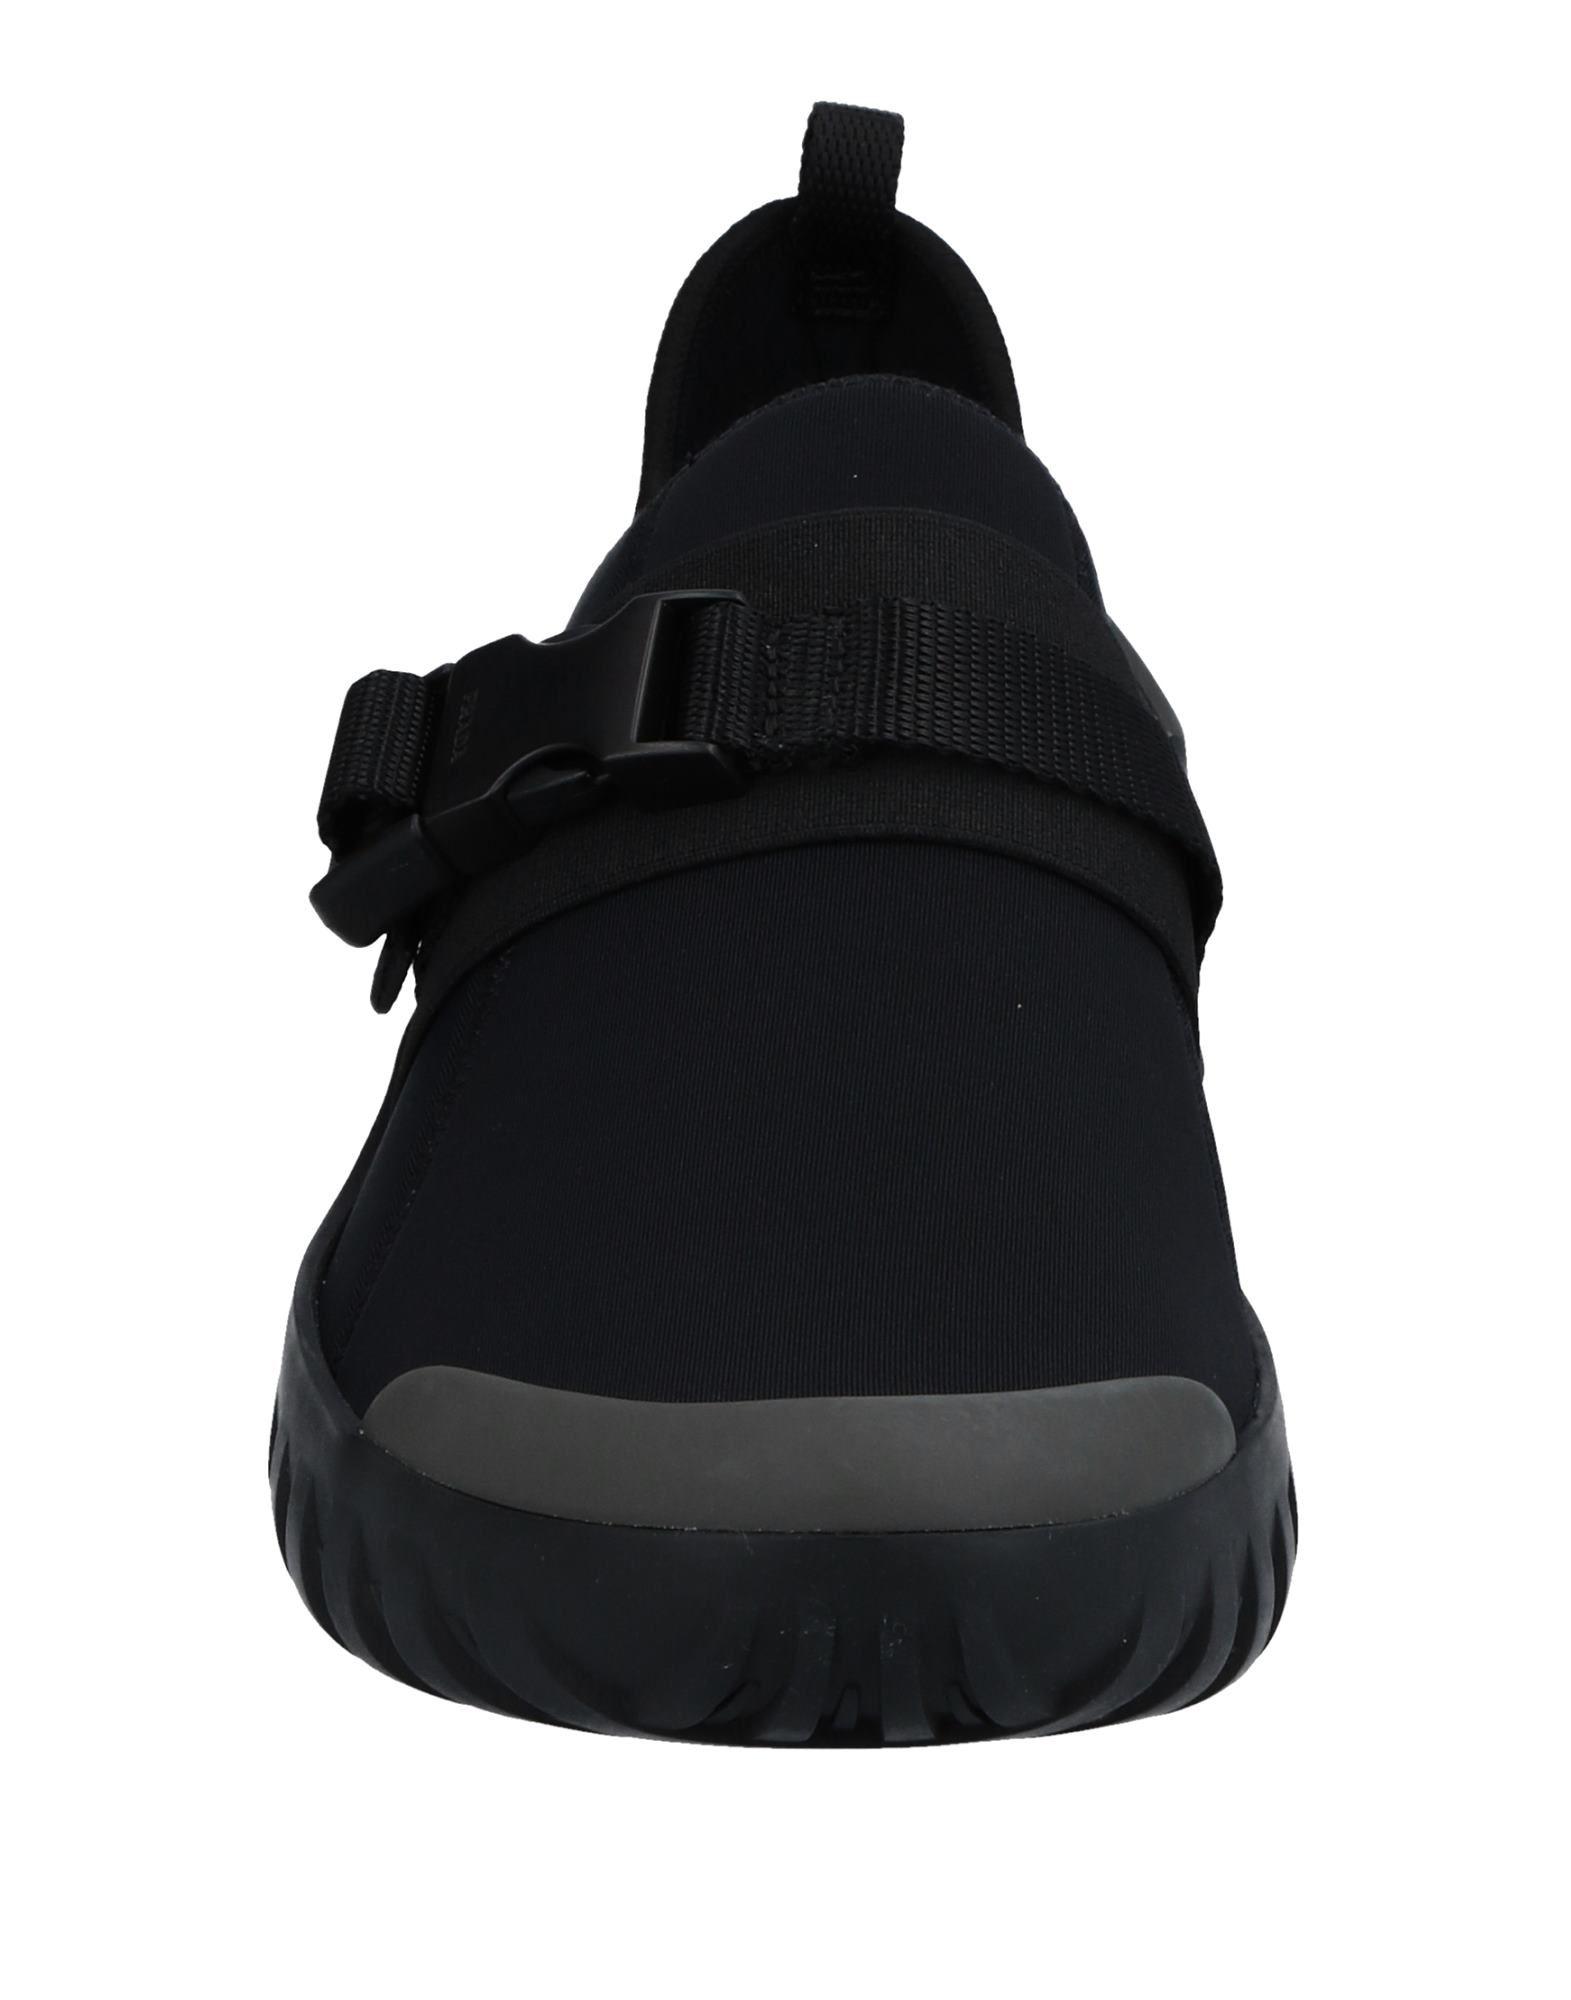 Prada 11510483BG Sport Sneakers Herren  11510483BG Prada Gute Qualität beliebte Schuhe cbeb6c